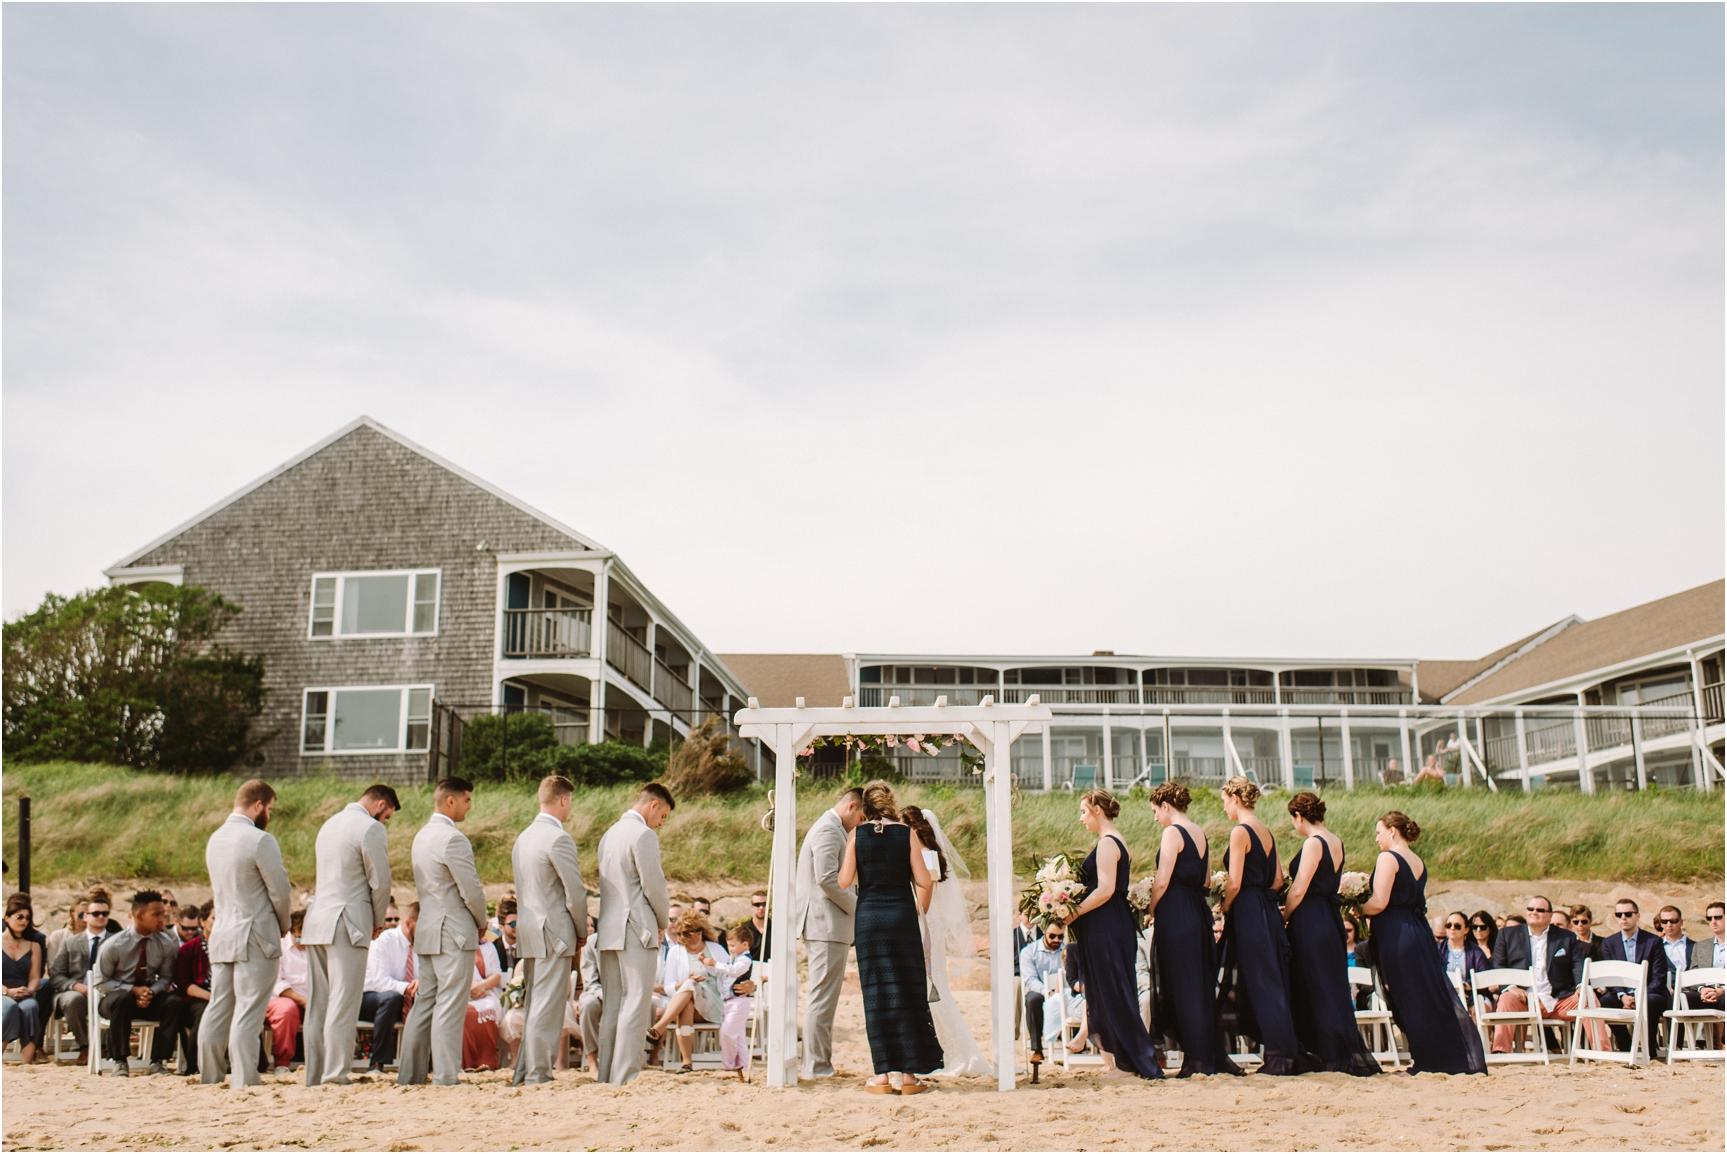 Sarah & Sam Pelham House Cape Cod Wedding Photographer-95.jpg